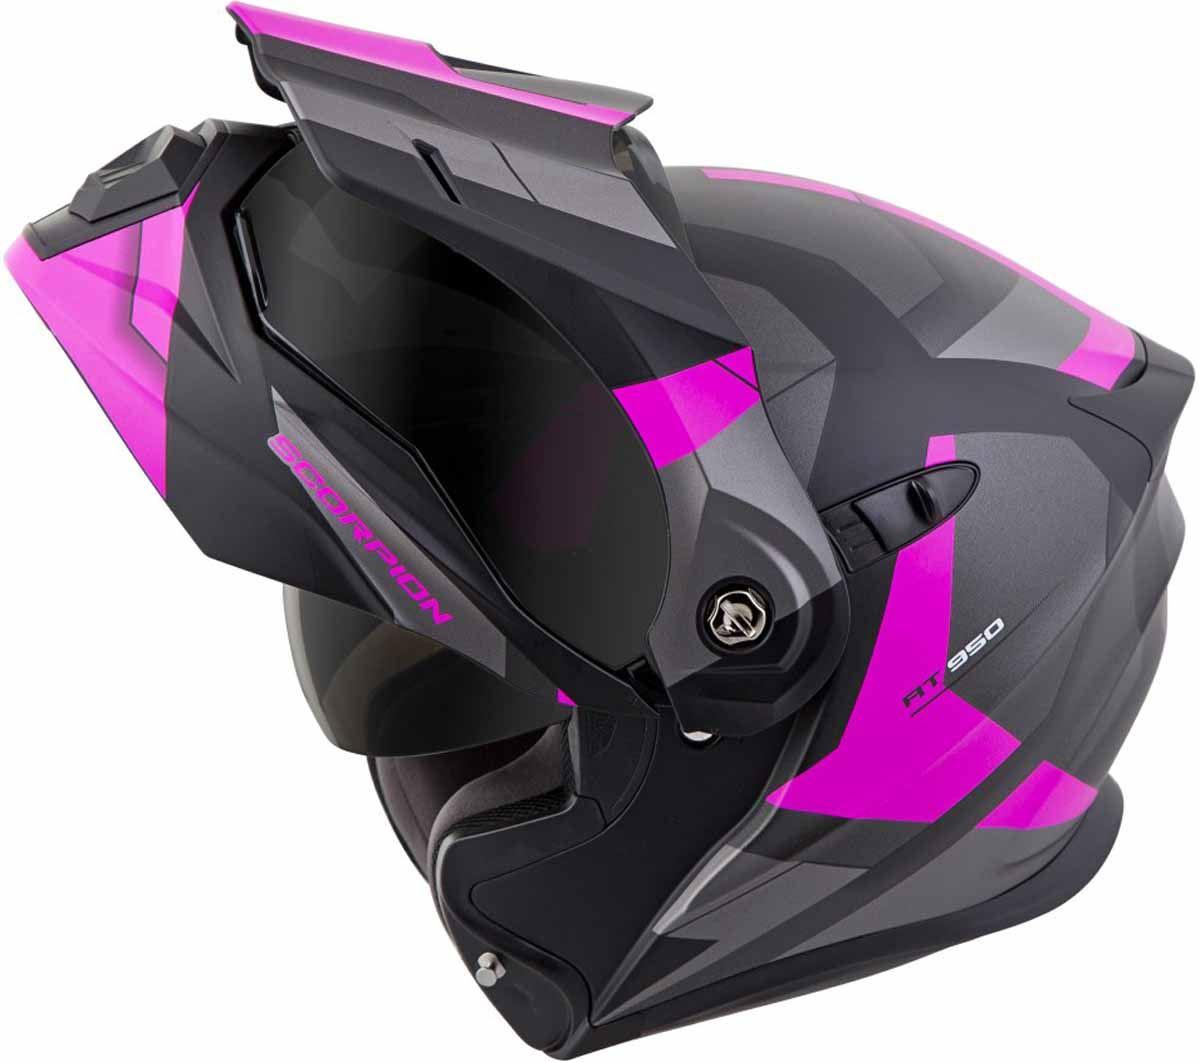 Scorpion-EXO-AT950-Helmet-Flip-Up-Modular-Dual-Sport-Adventure-ADV-DOT-XS-3XL miniature 45